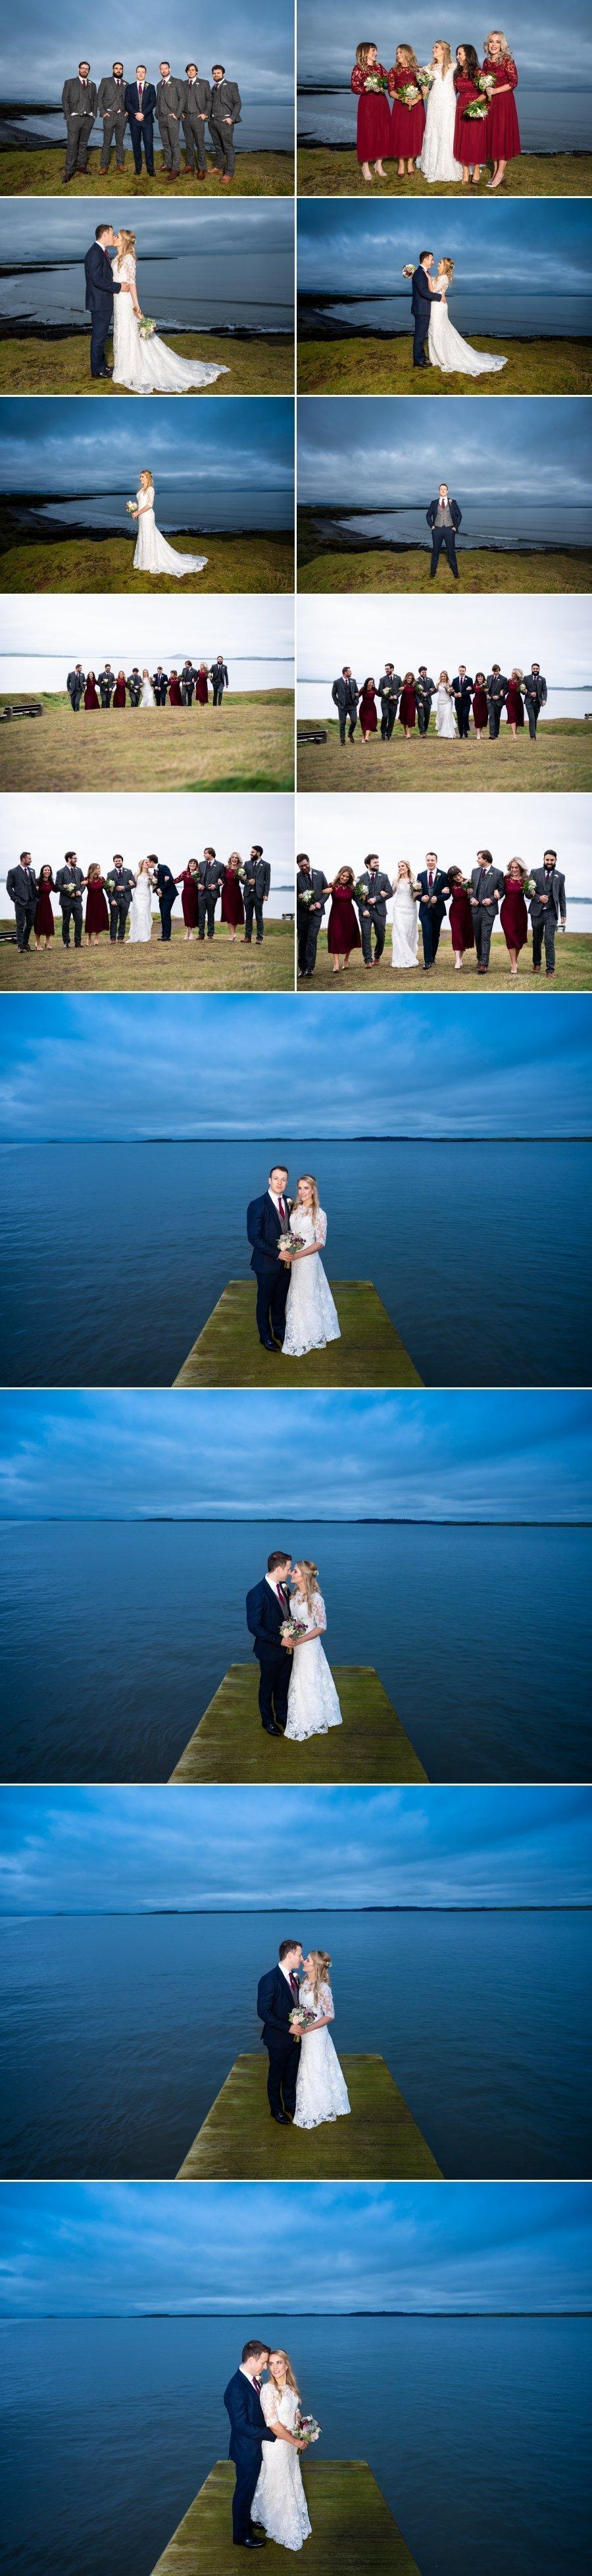 Markree Castle Sligo Wedding bride and groom photos at rosses point pier